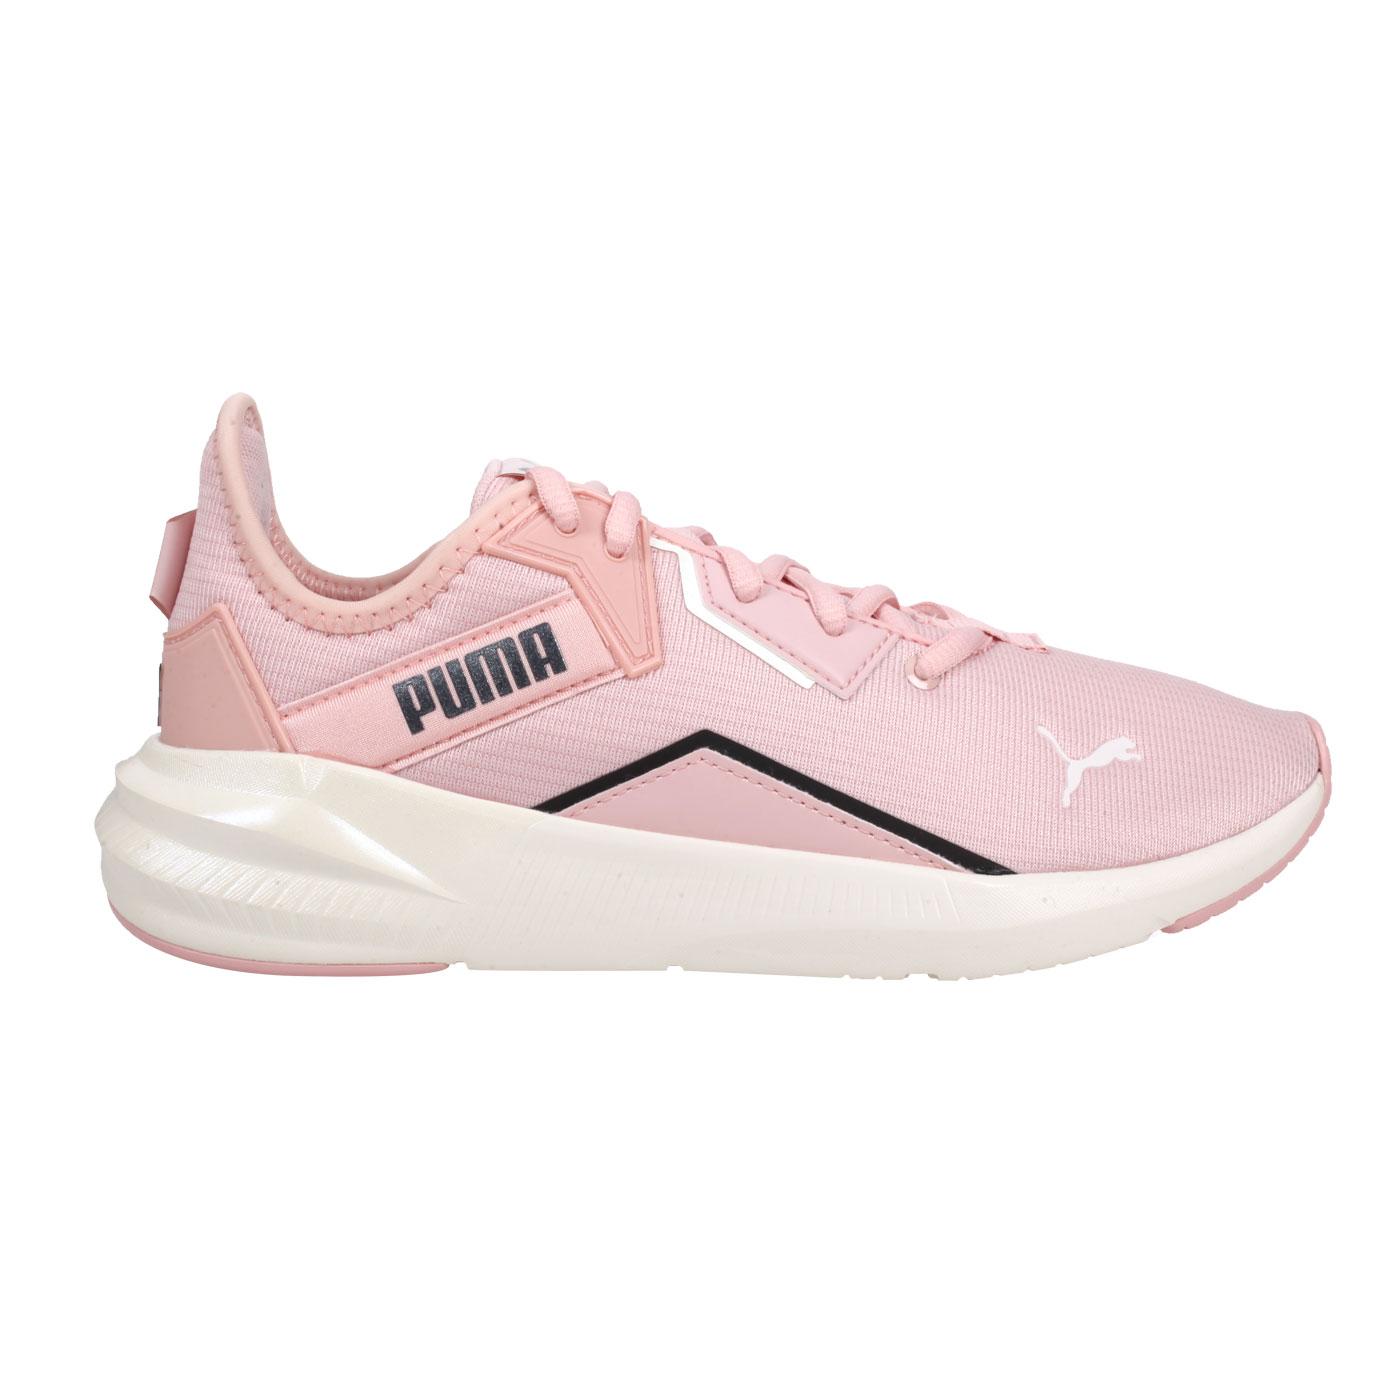 PUMA 女款休閒運動鞋  @Platinum Shimmer Wn's@19377201